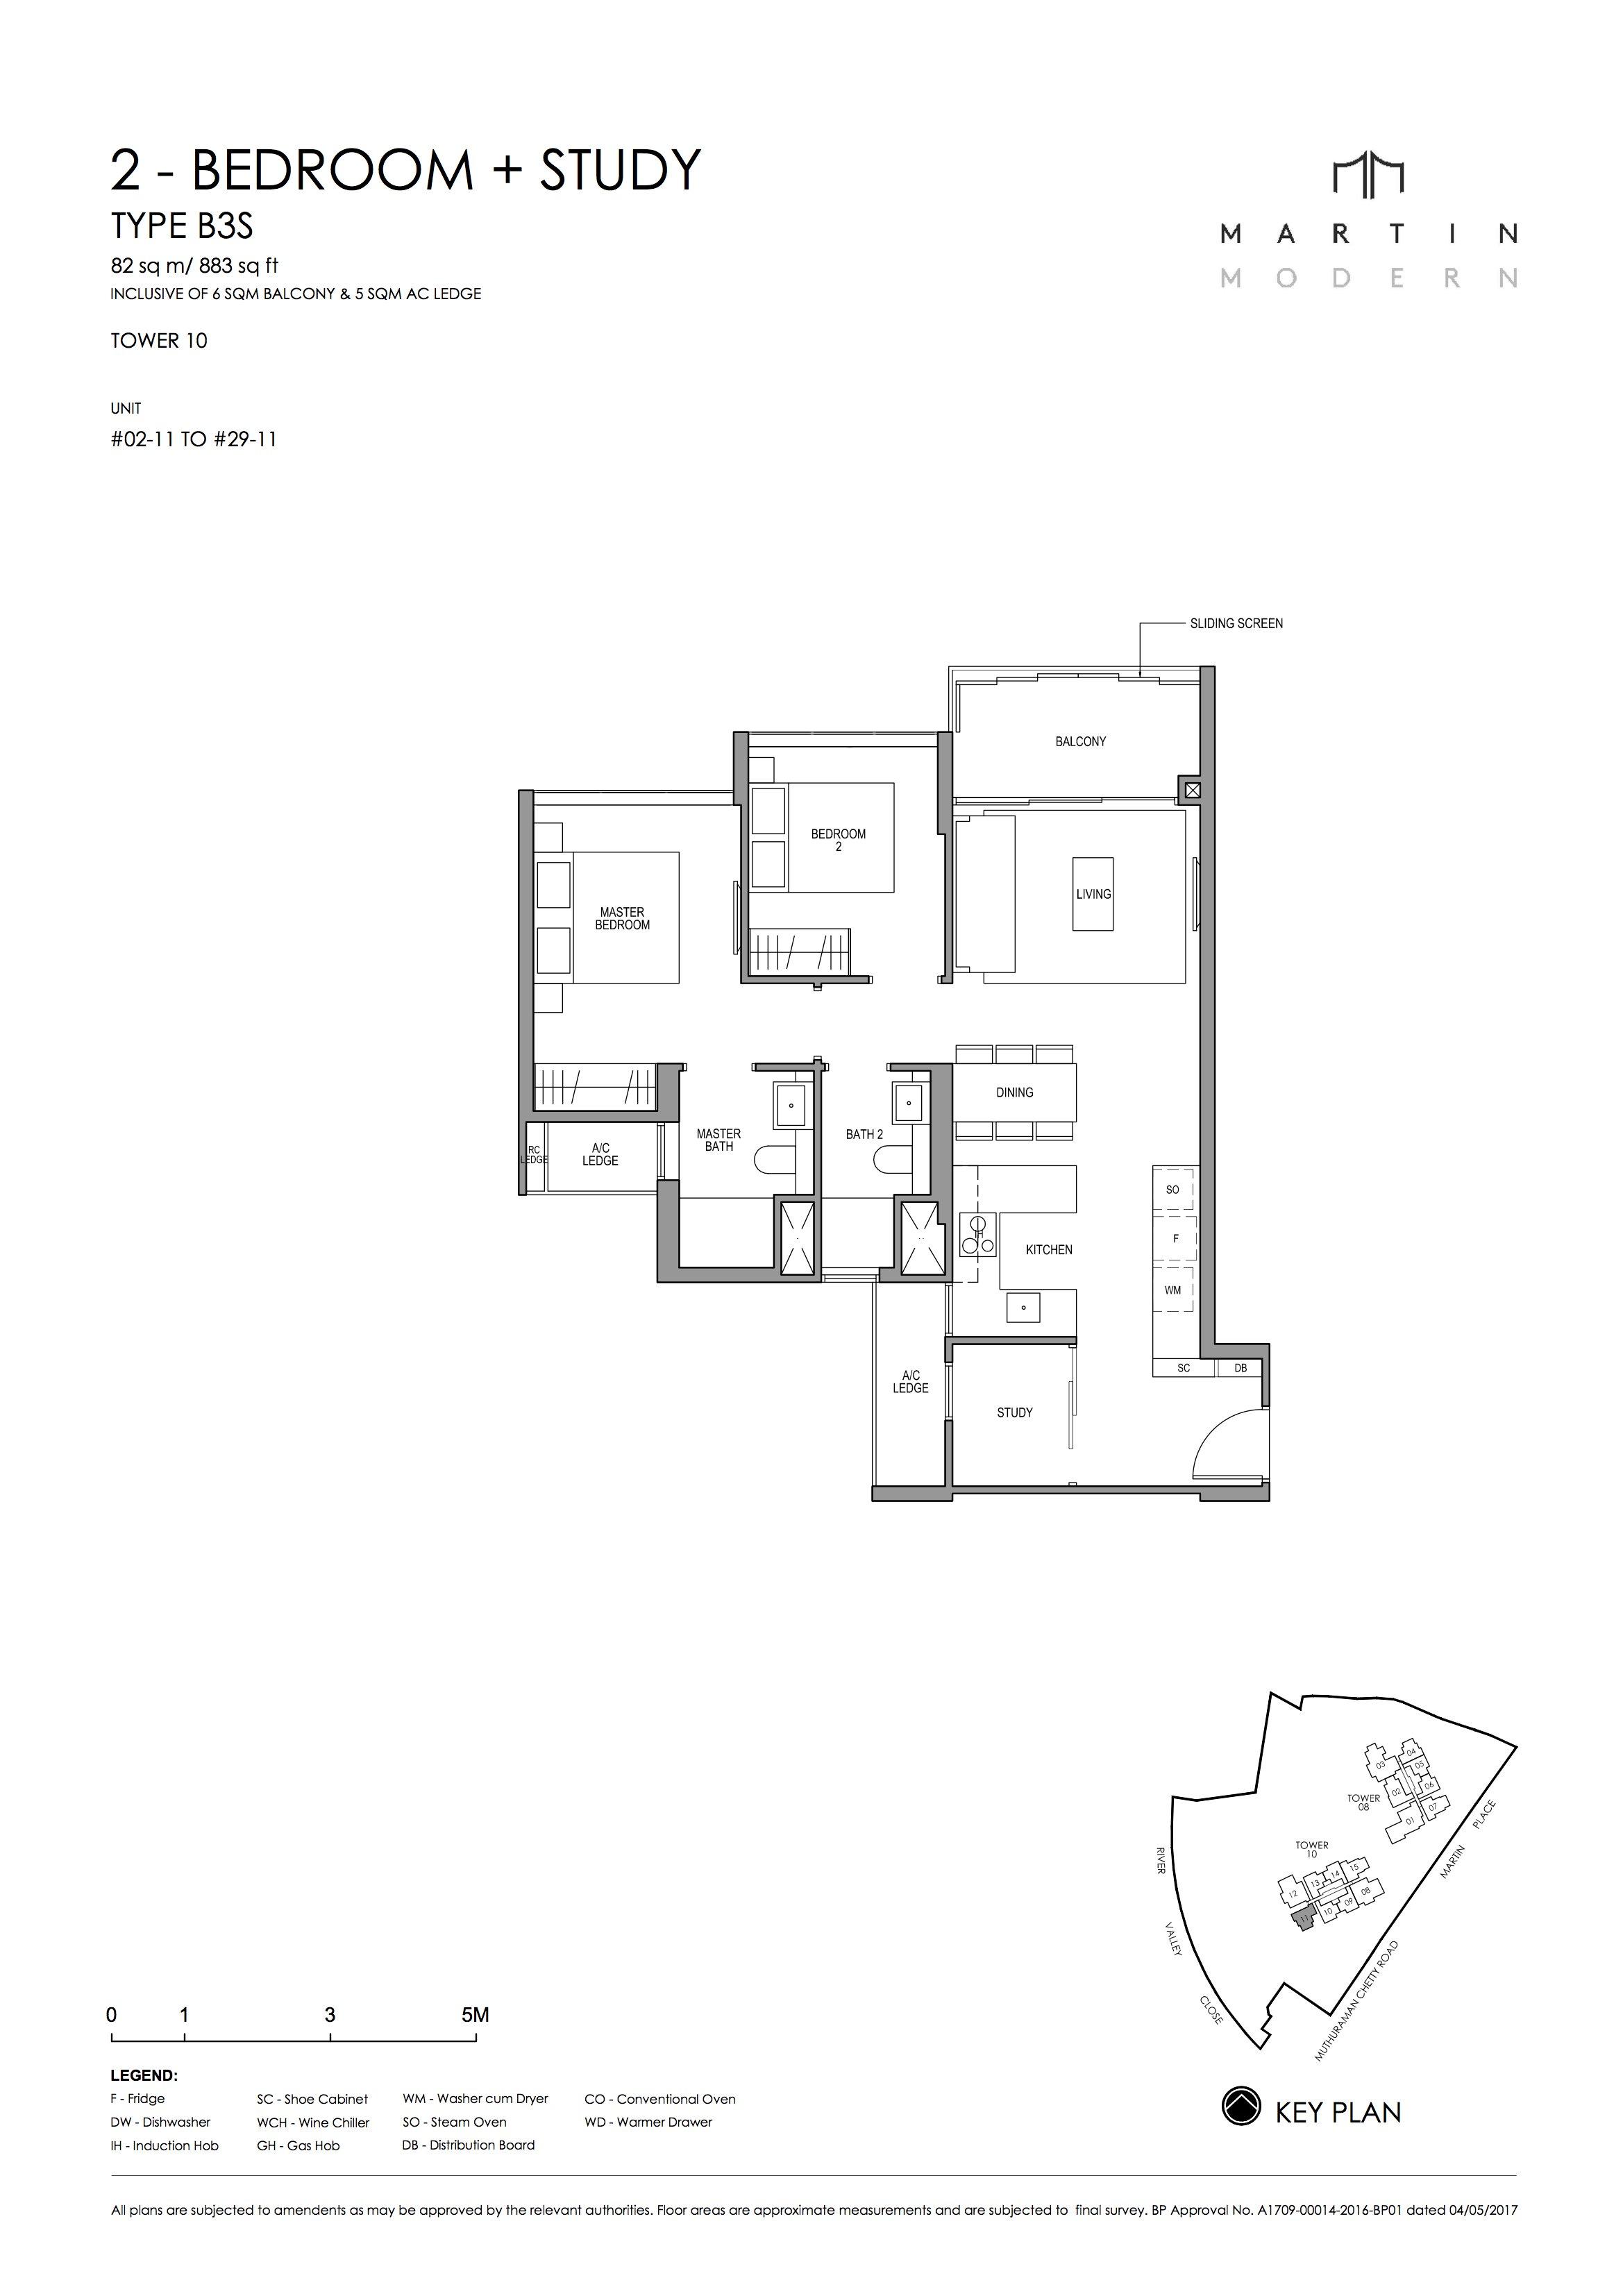 MARTIN MODERN 2-Bedroom TYPE B3S